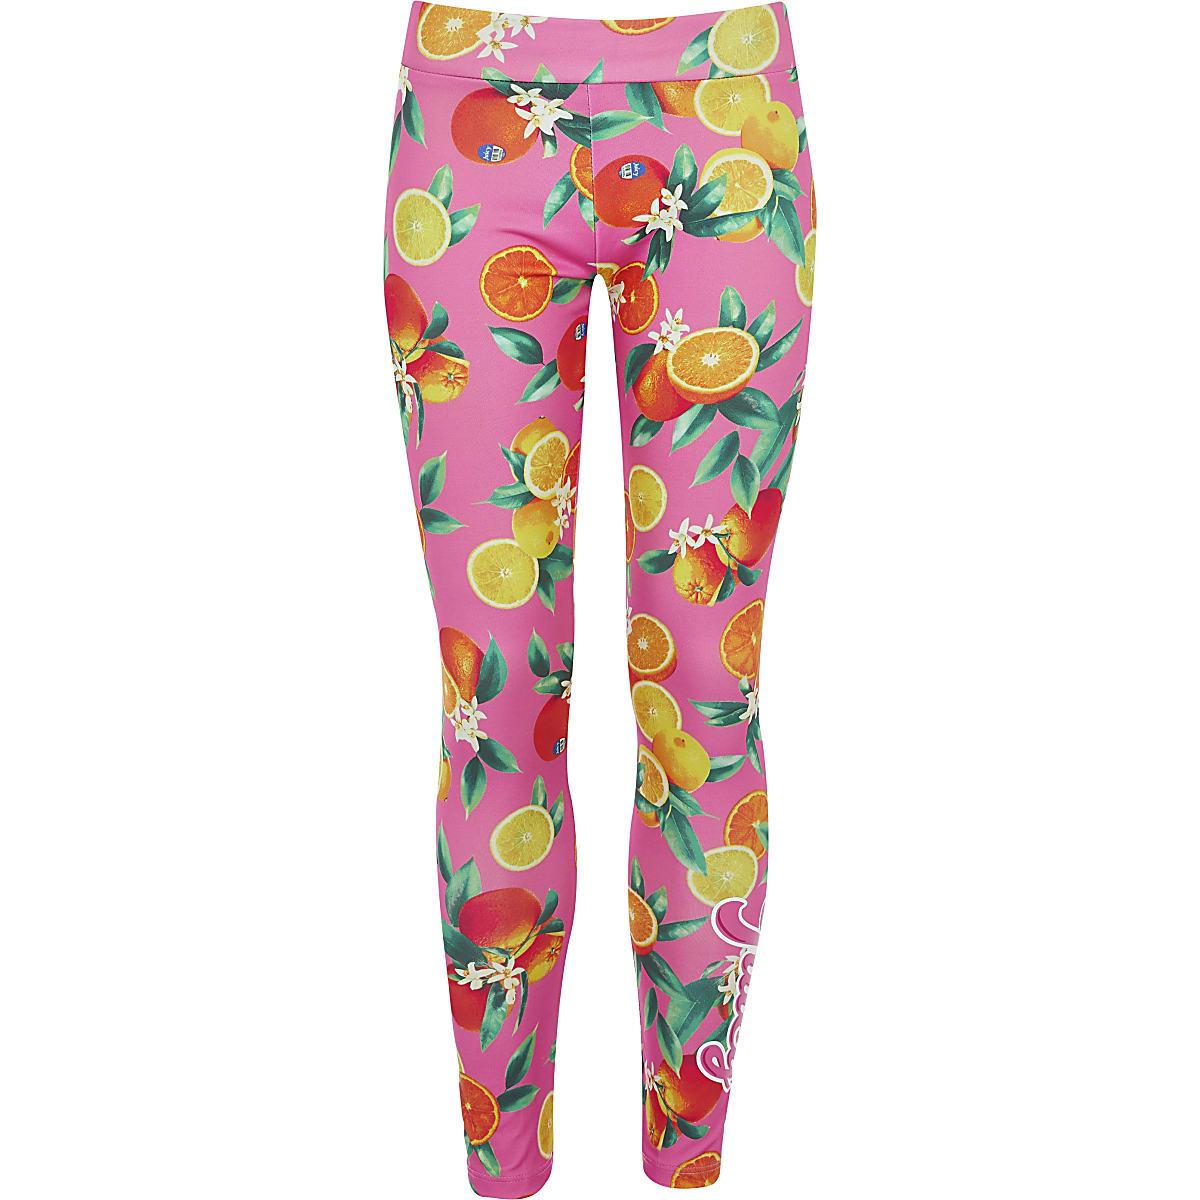 Girls pink Juicy Couture fruit leggings